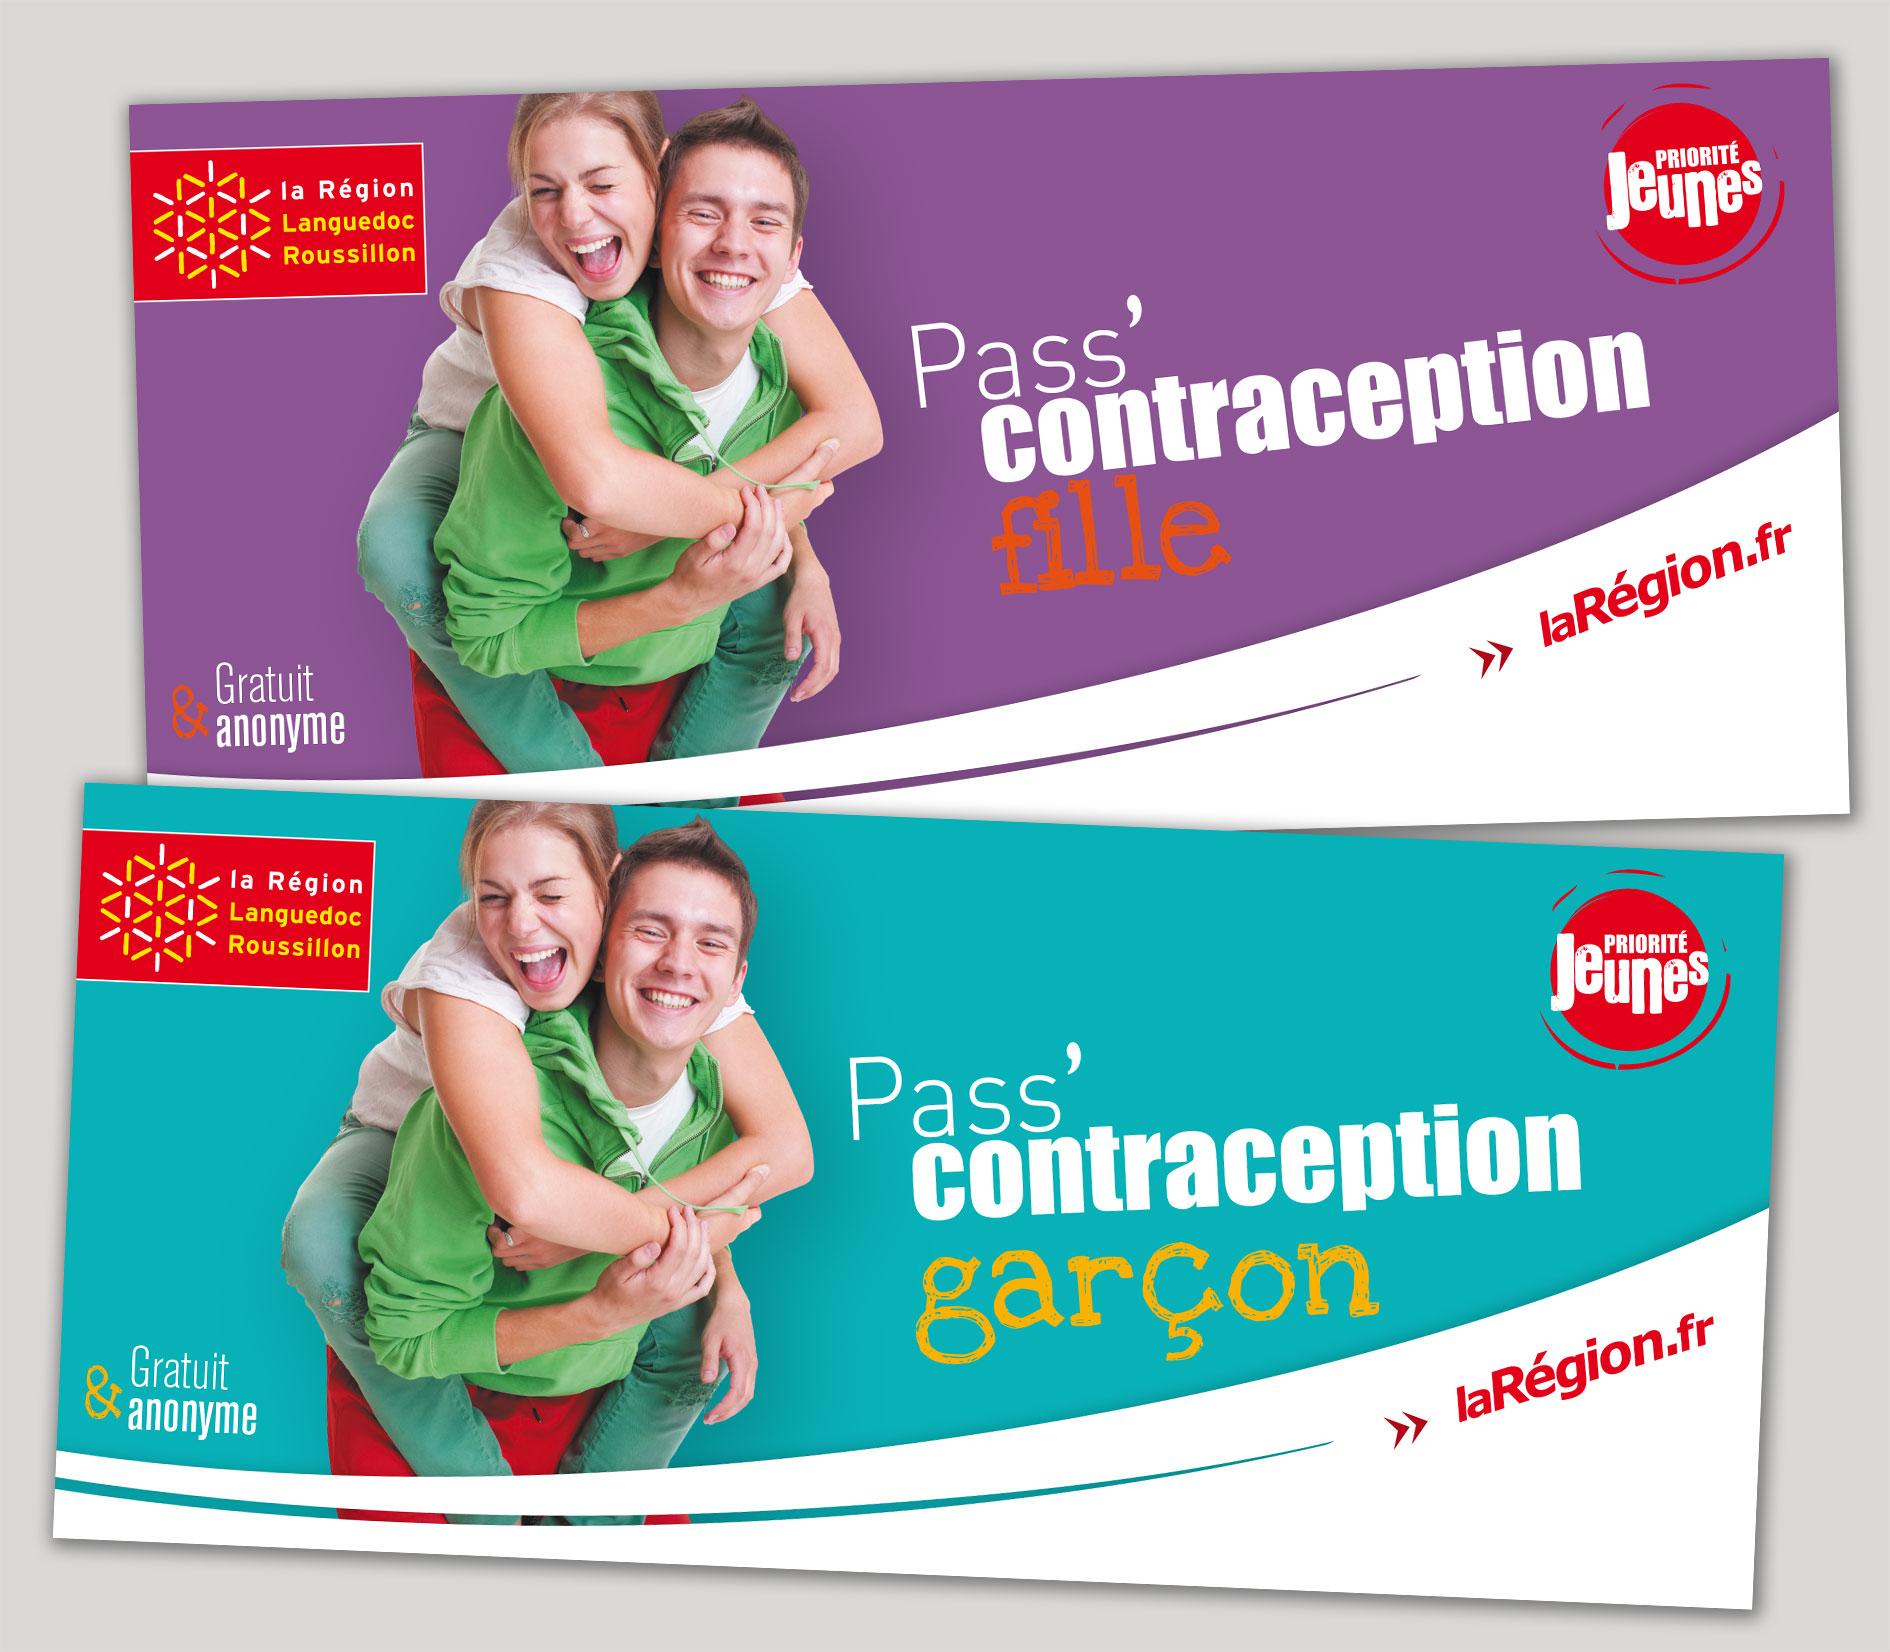 image-passcontraception-01.jpg